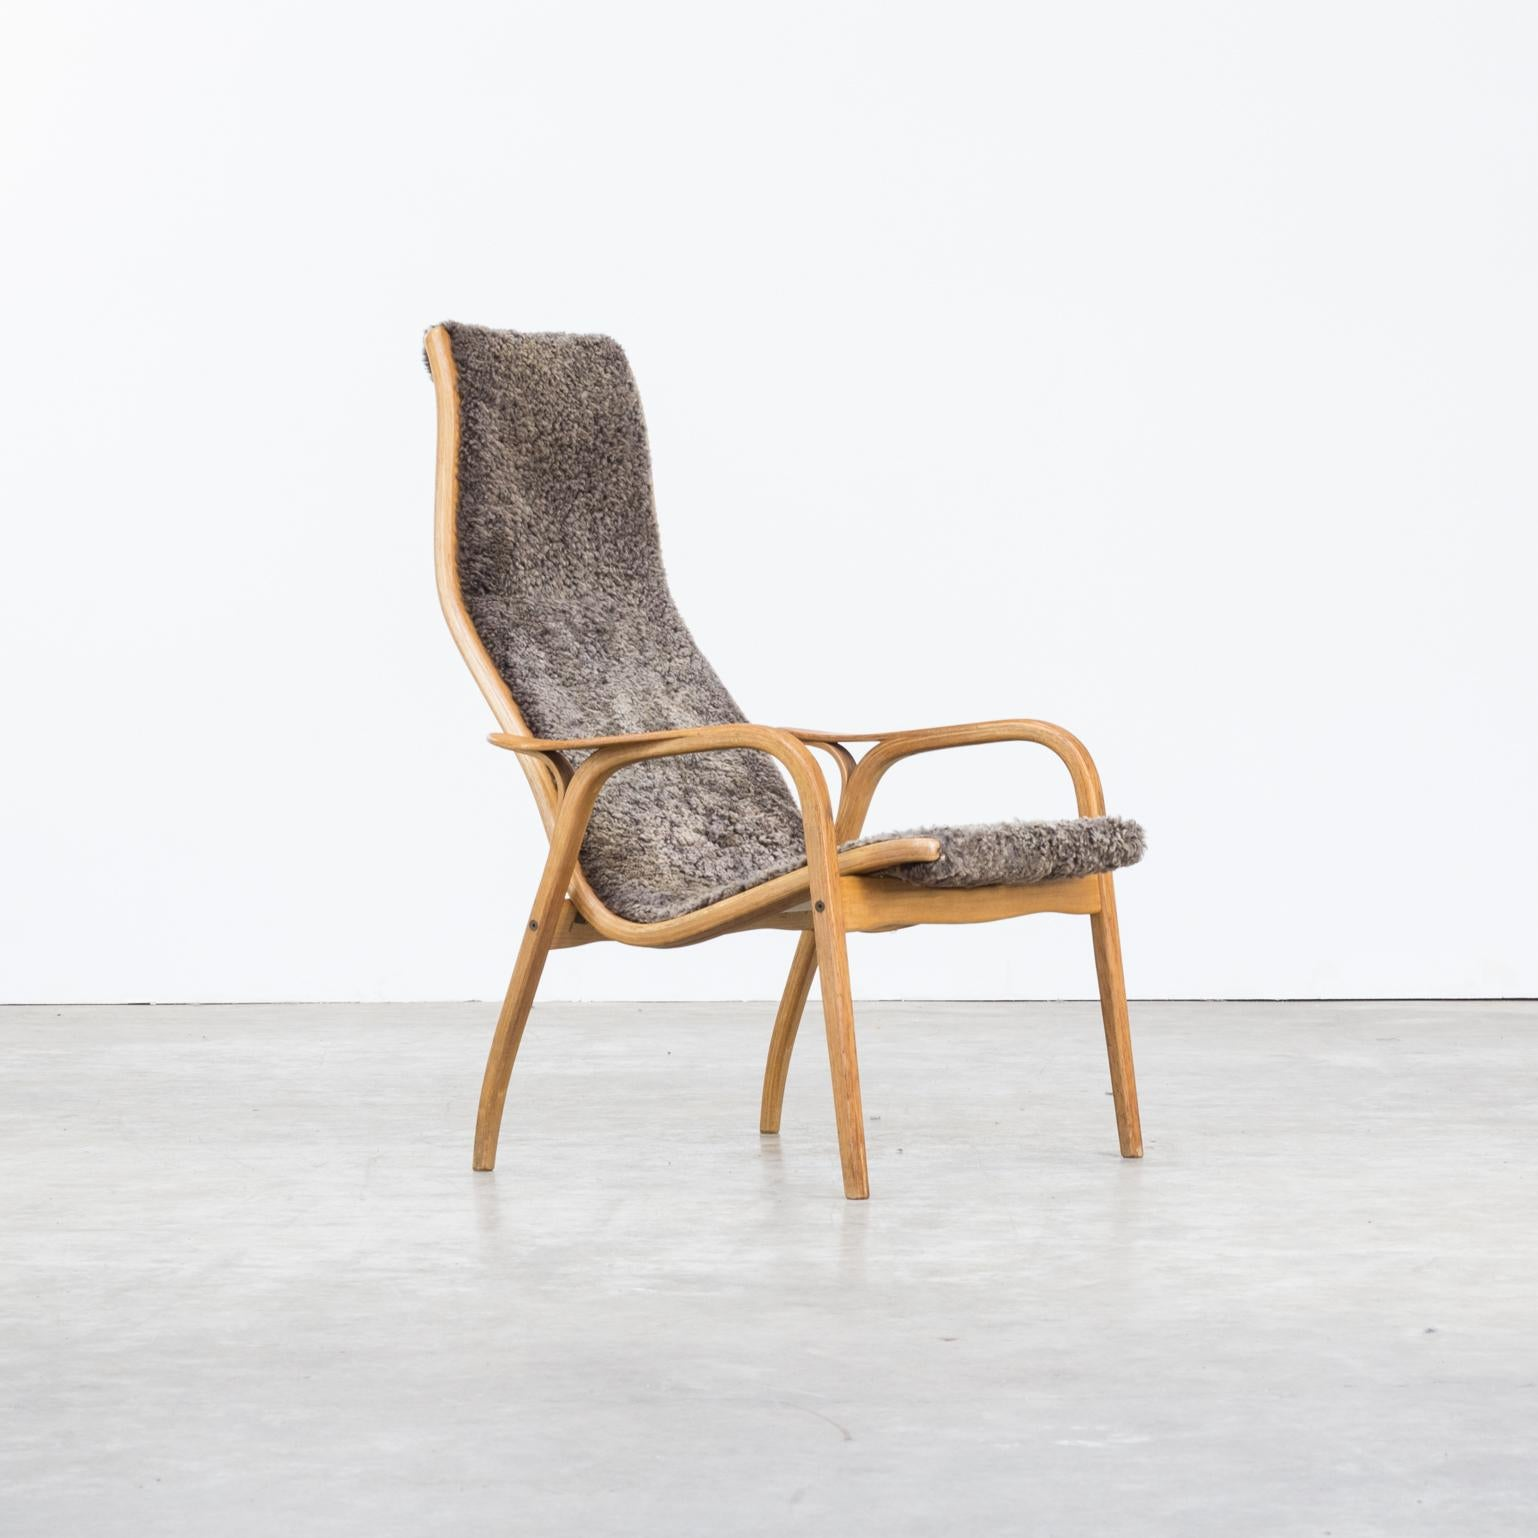 Fauteuil Retro Design.1950s Yngve Ekstrom Lamino Fauteuil For Swedese Mobler Ab